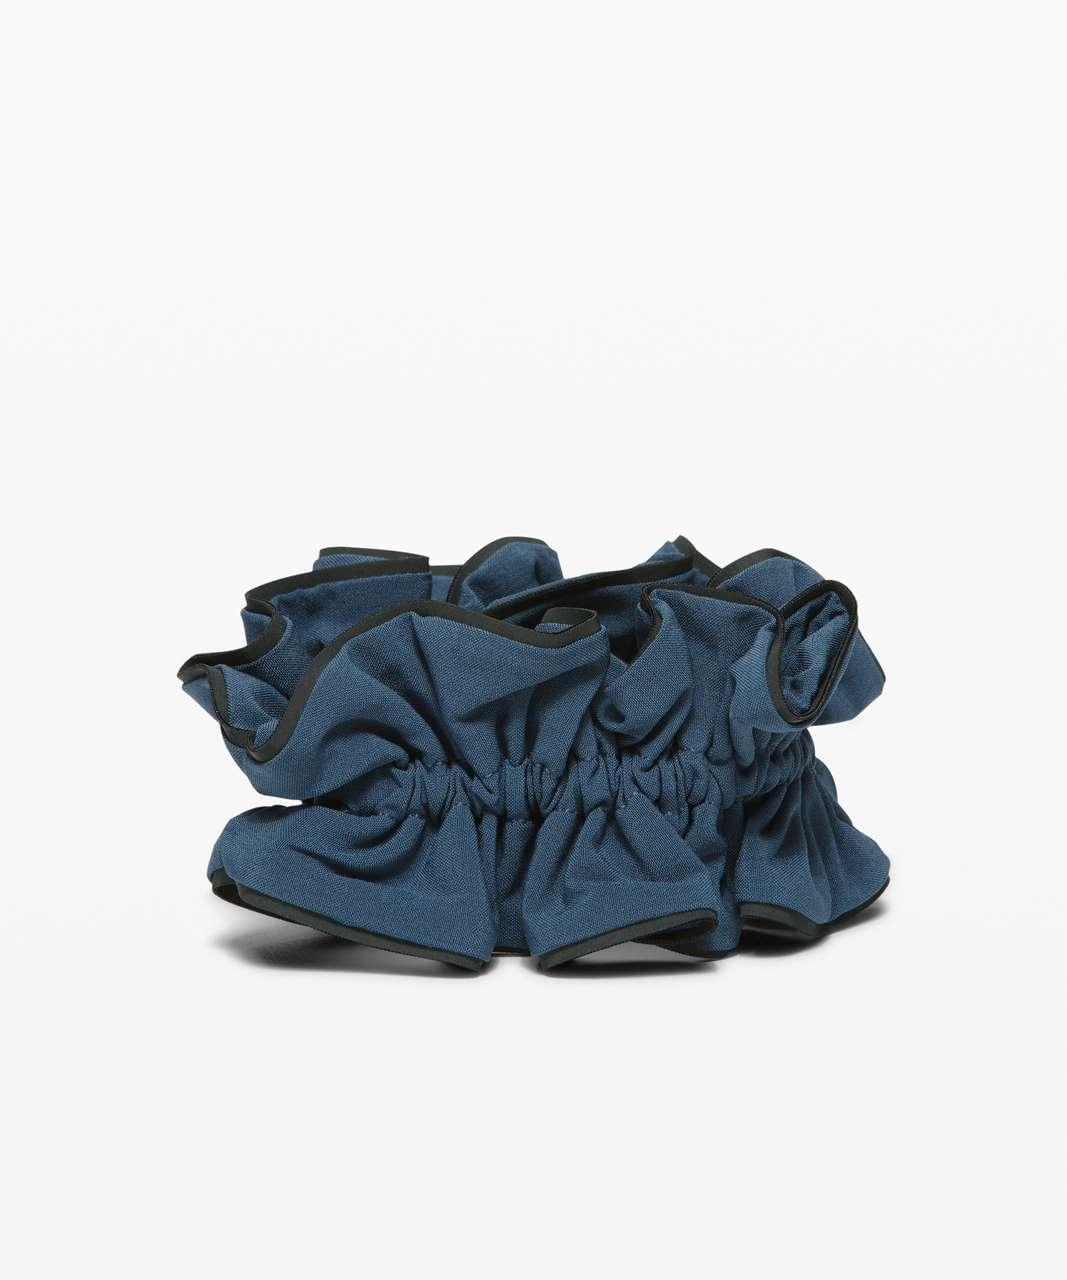 Lululemon Light Locks Scrunchie II - Ink Blue